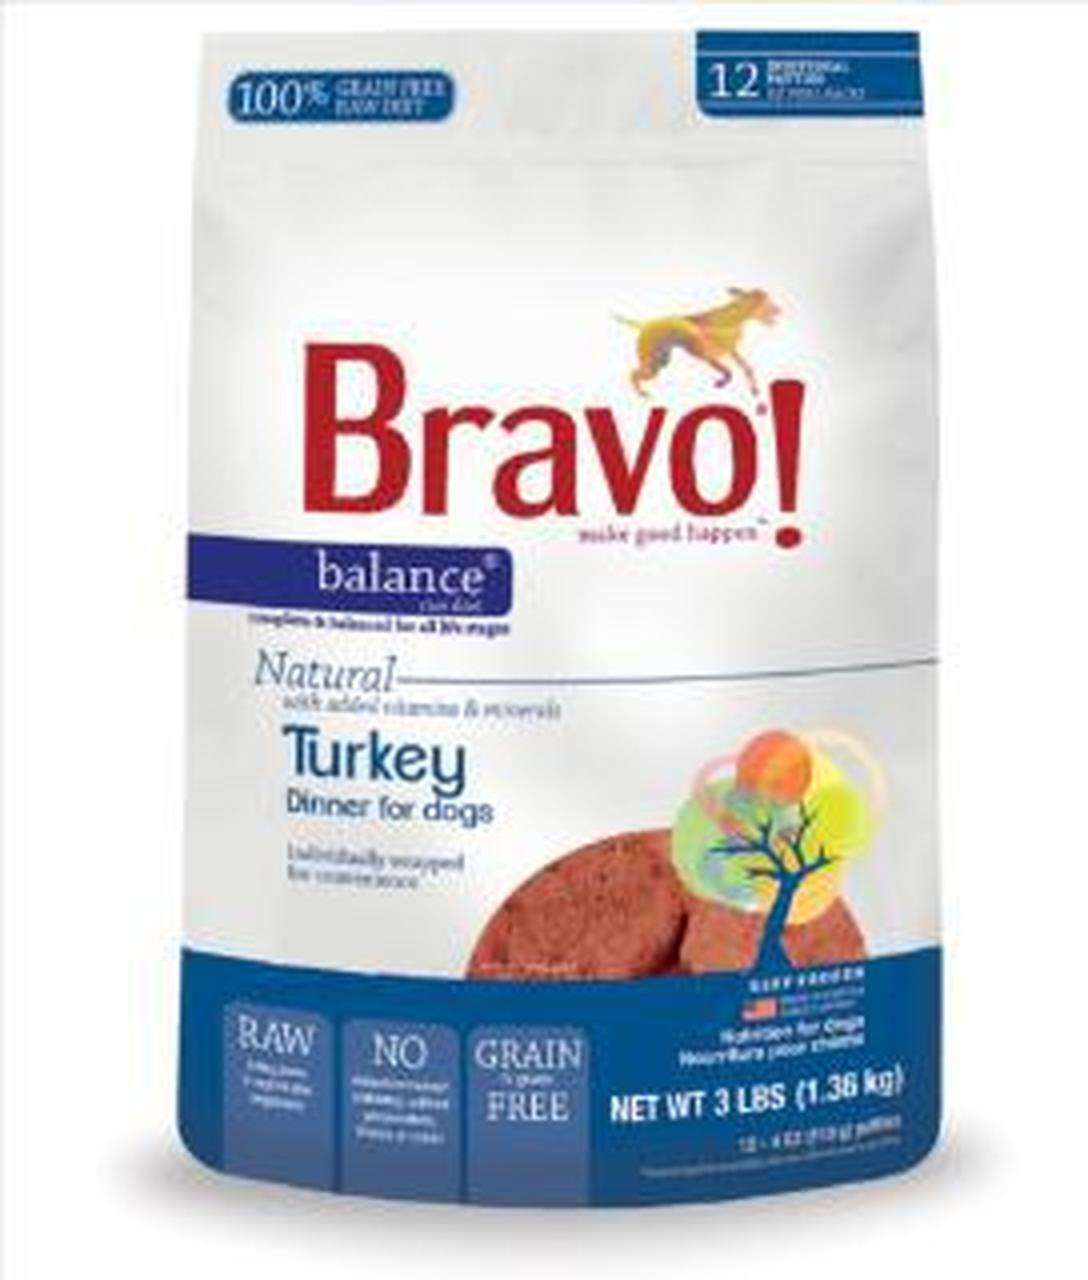 Bravo Blends Turkey Patties Raw Frozen Dog Food, 5-lb